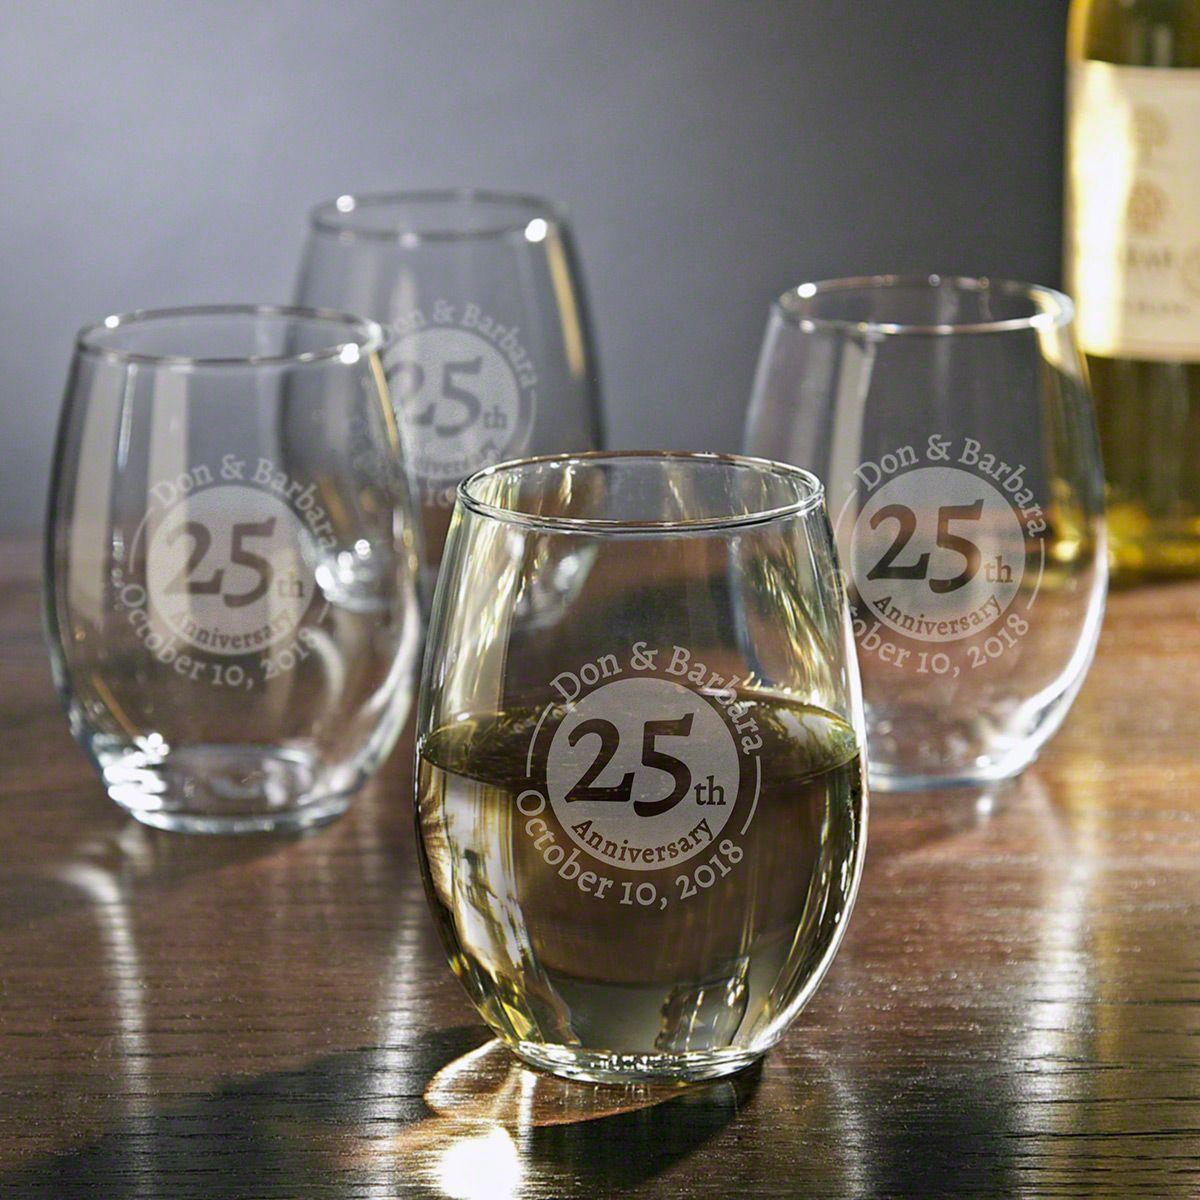 Landmark Anniversary Etched Glass Stemless Wine Glasses